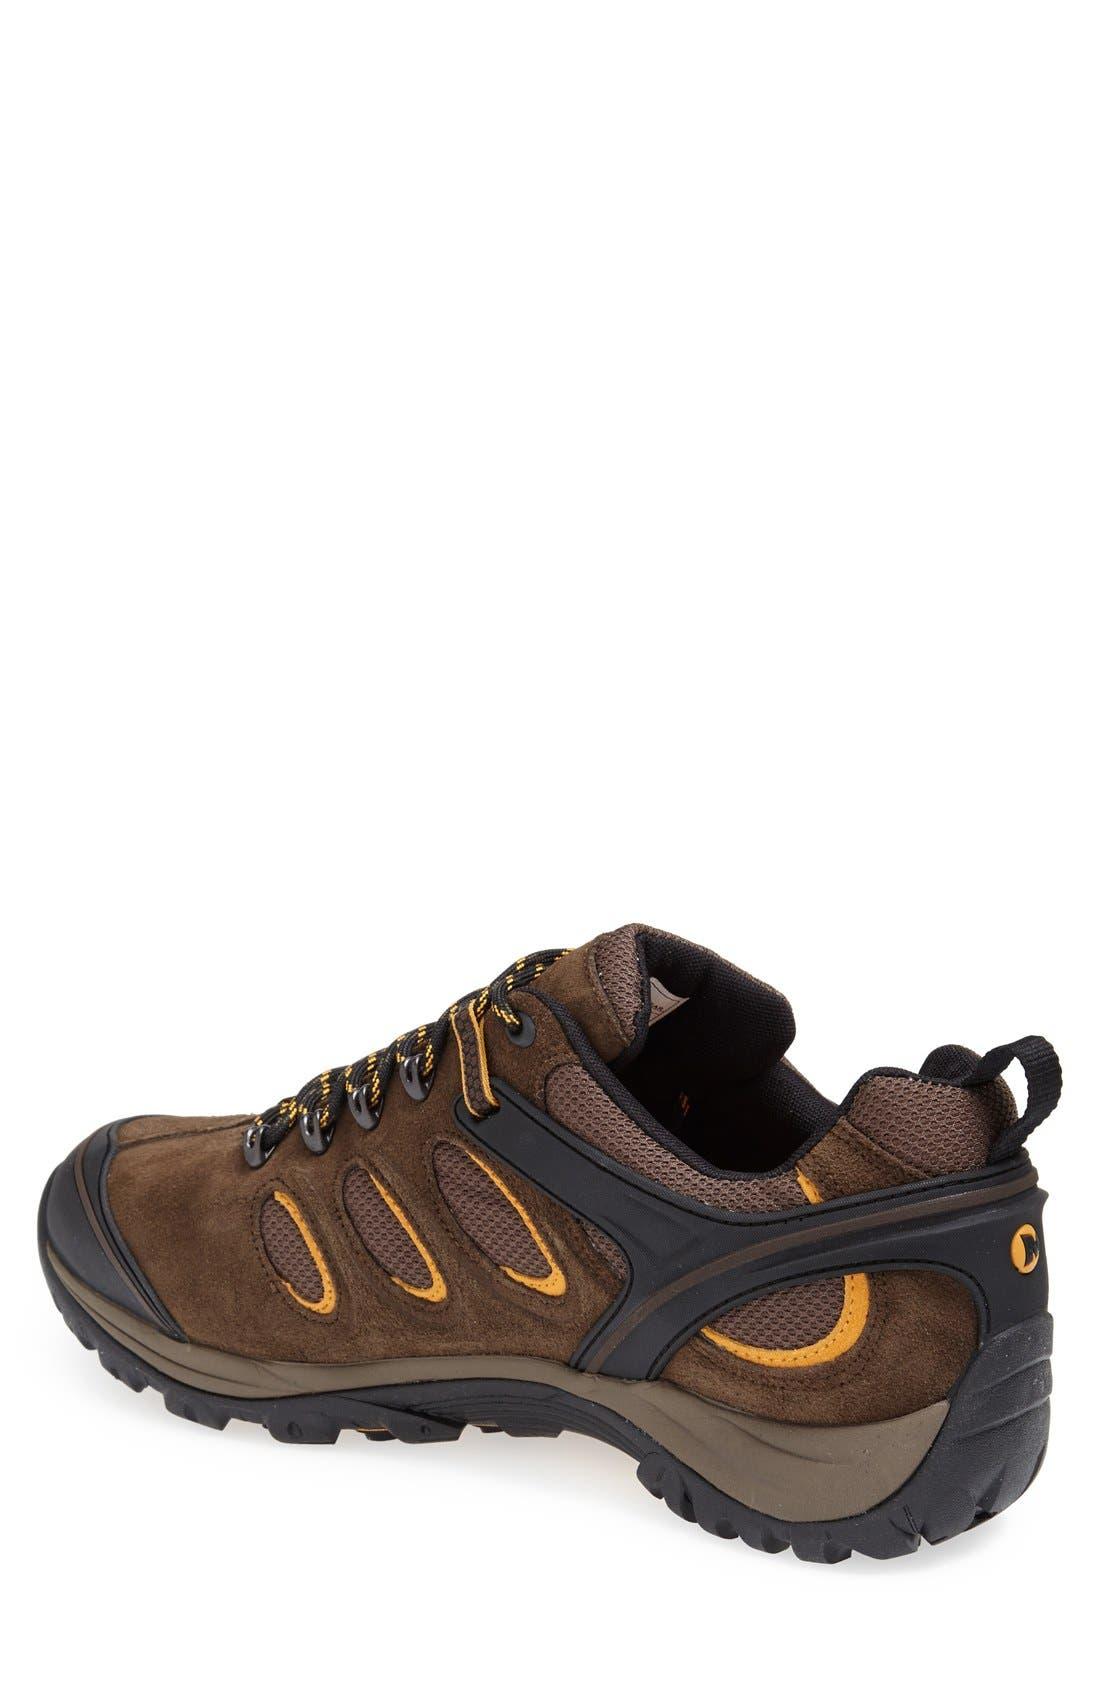 'Chameleon 5' Waterproof Hiking Shoe,                             Alternate thumbnail 2, color,                             200